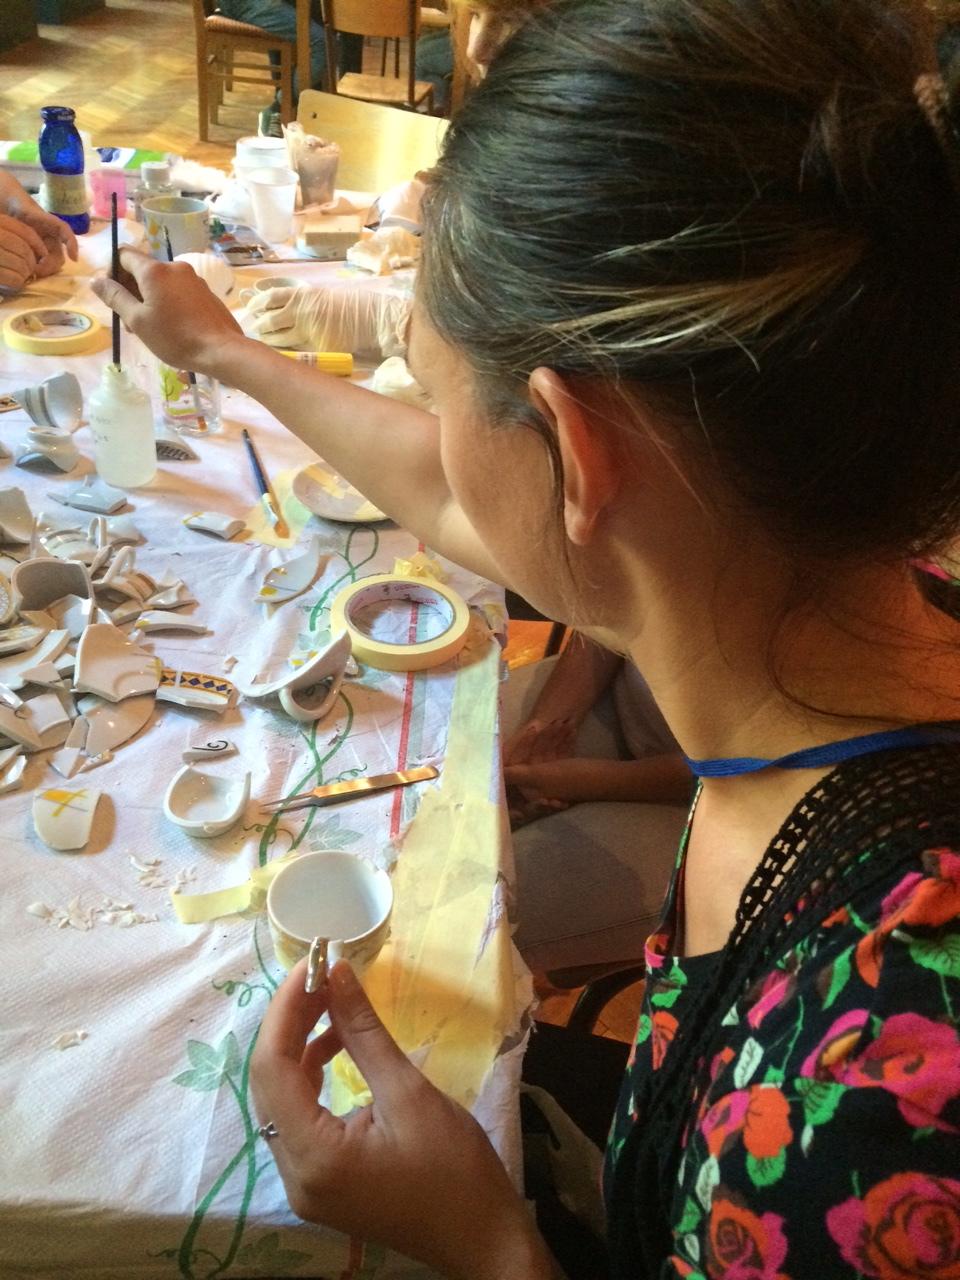 Having a go at reconstructing some broken ceramics